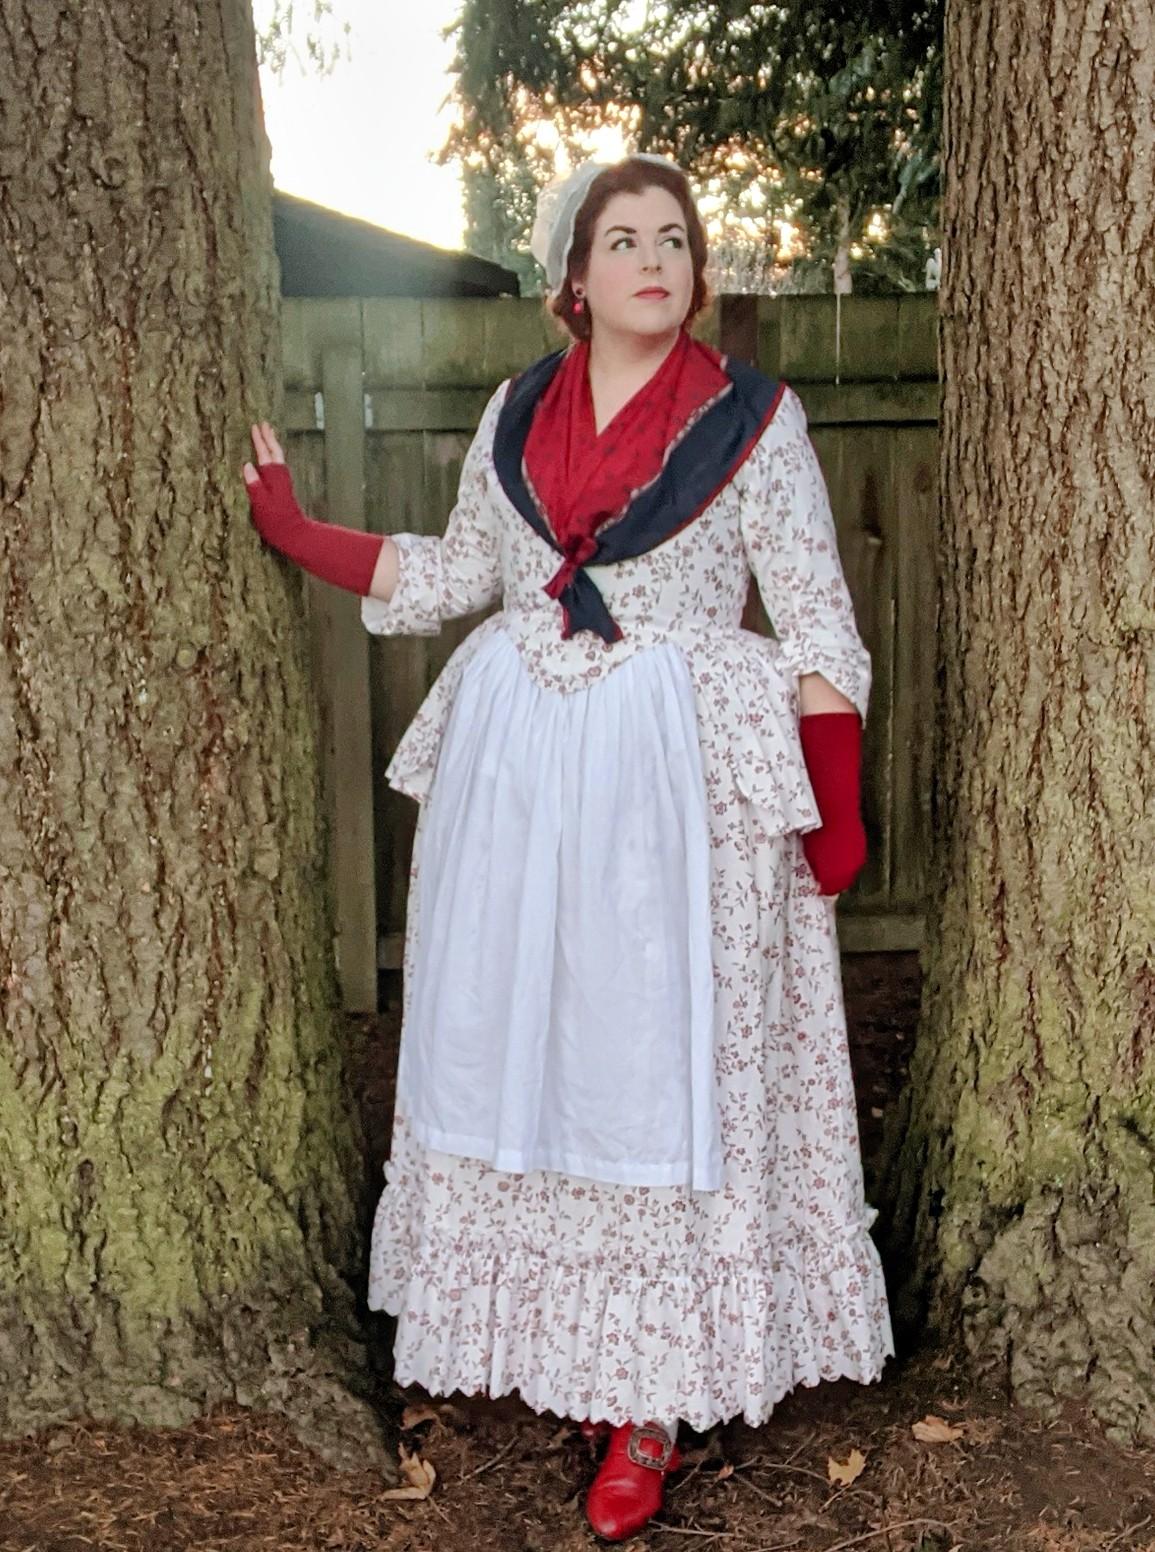 Rebecca of @ladyrebeccafashions in the Scroop + Virgil's Amalia Jacket